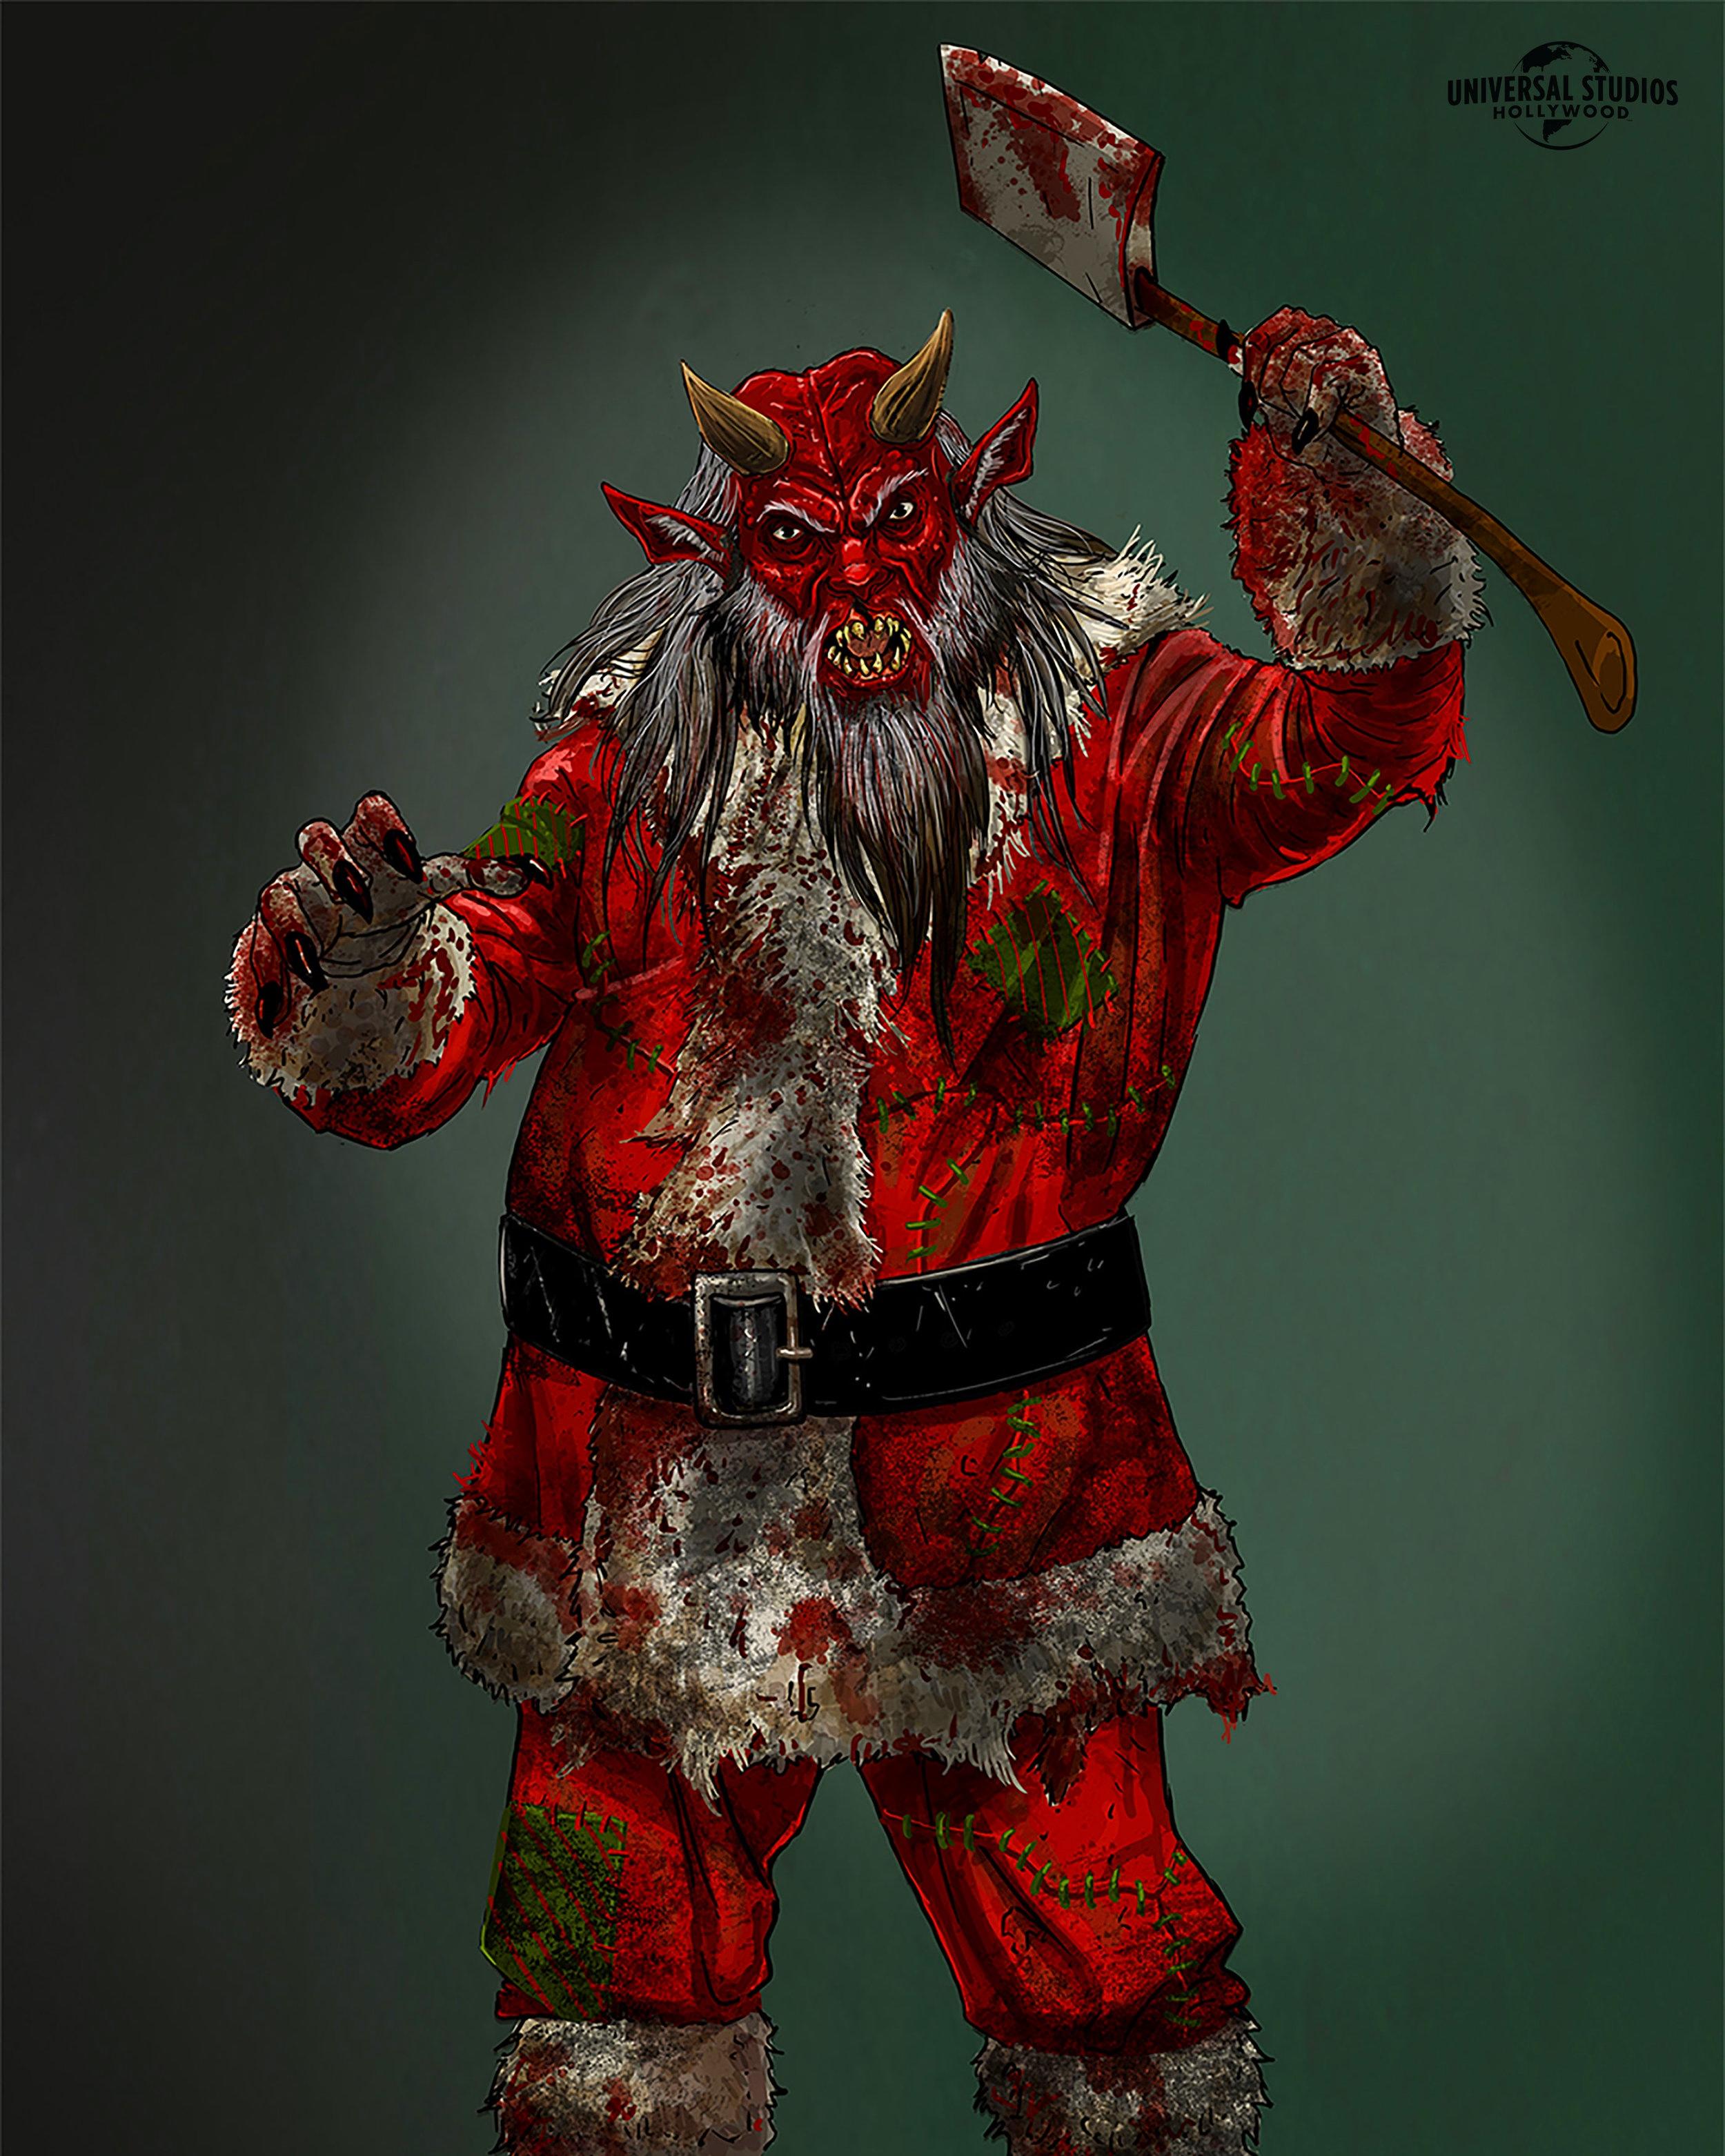 Christmas-Santa-Claus.jpg